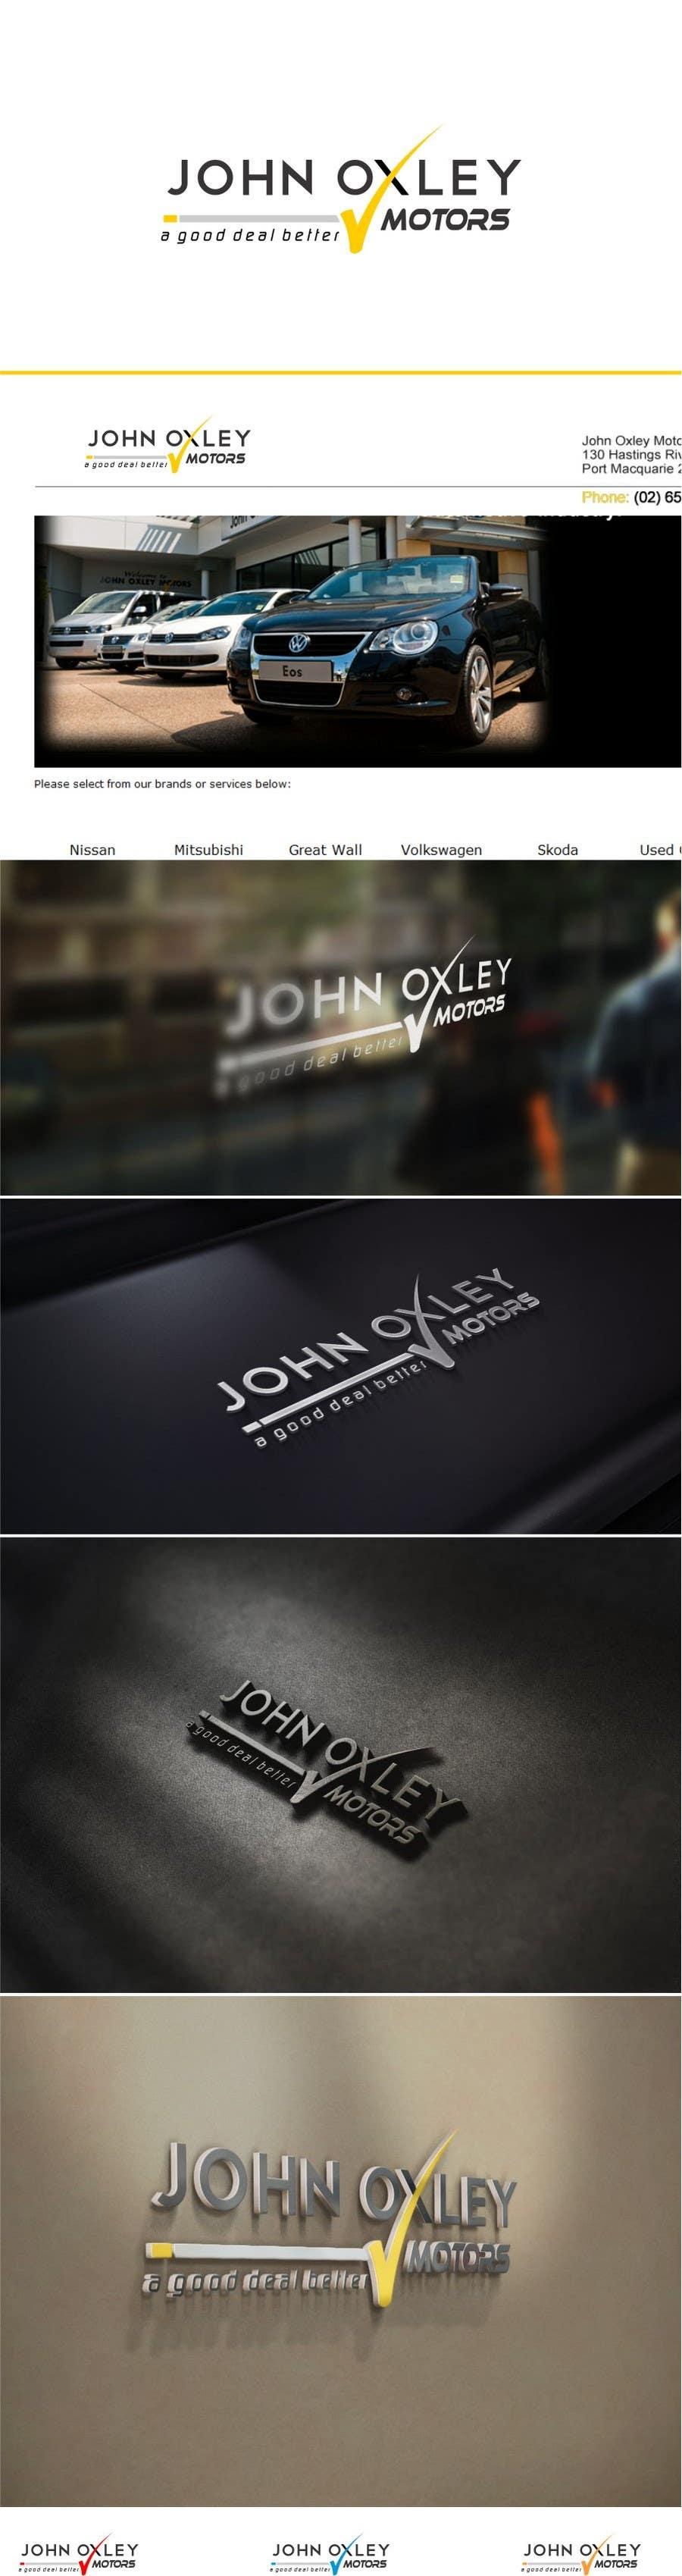 #224 for Design a Logo for John Oxley Motors by timedsgn